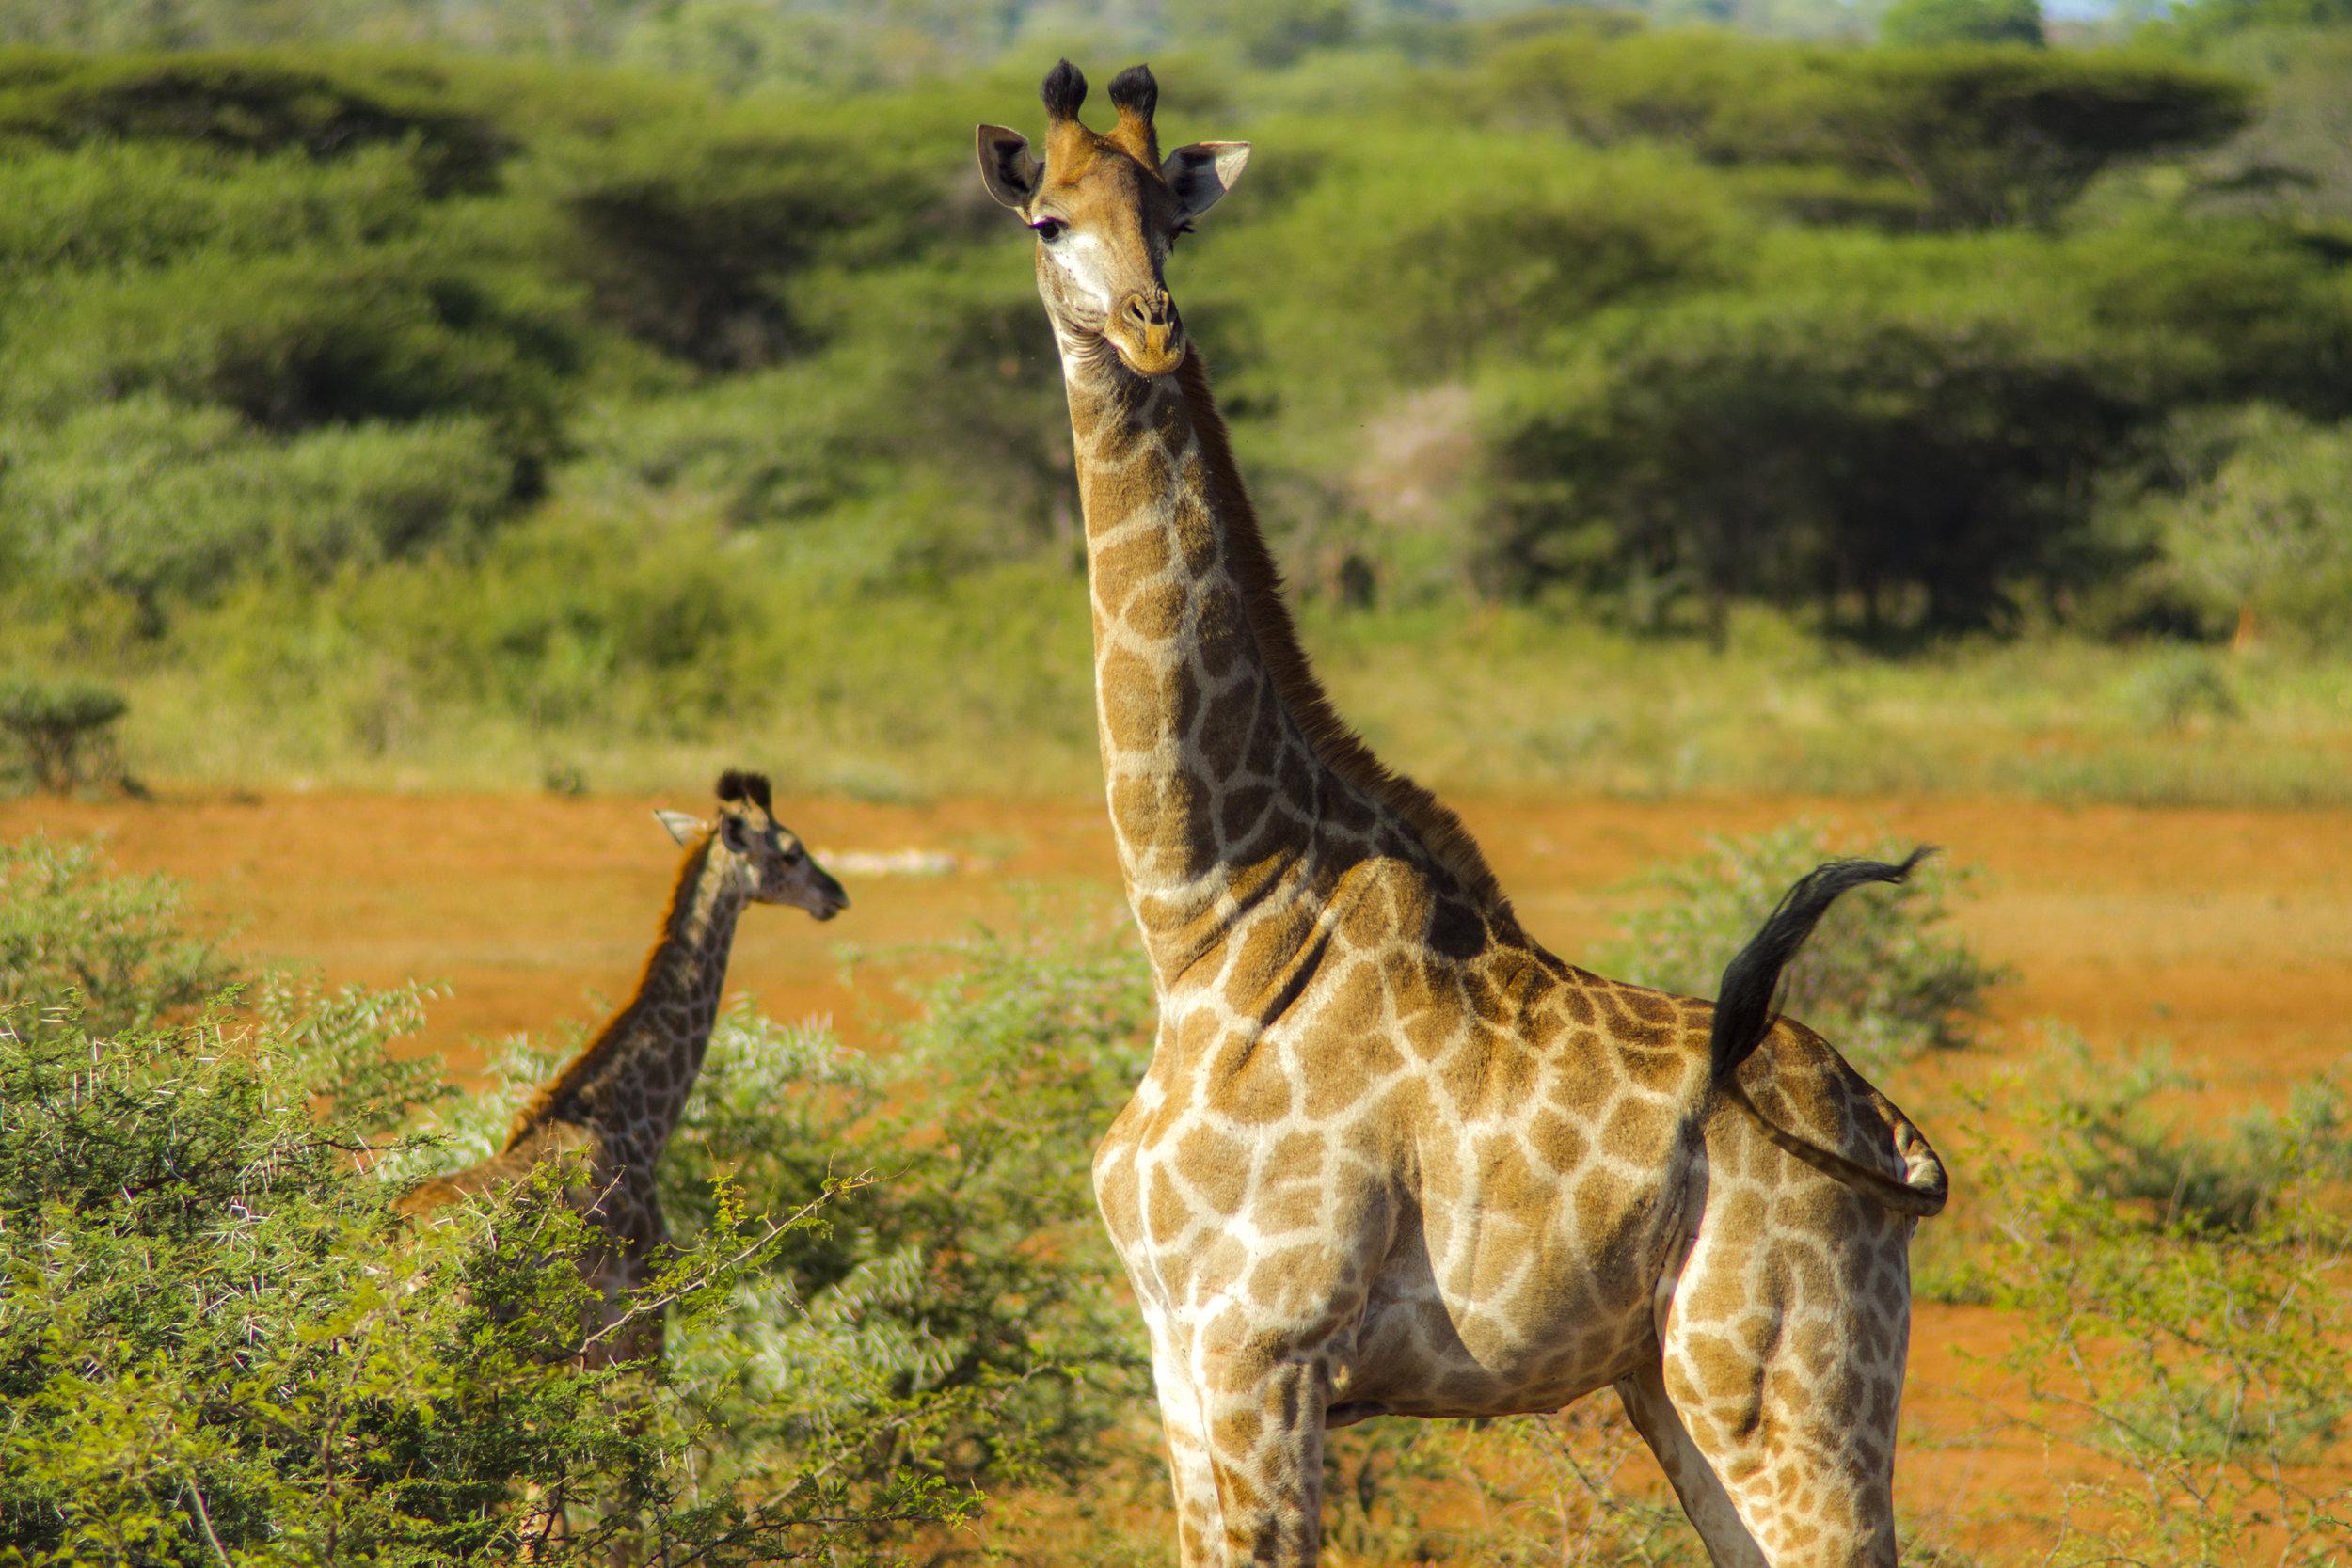 SouthAfrica_sm-4113.jpg